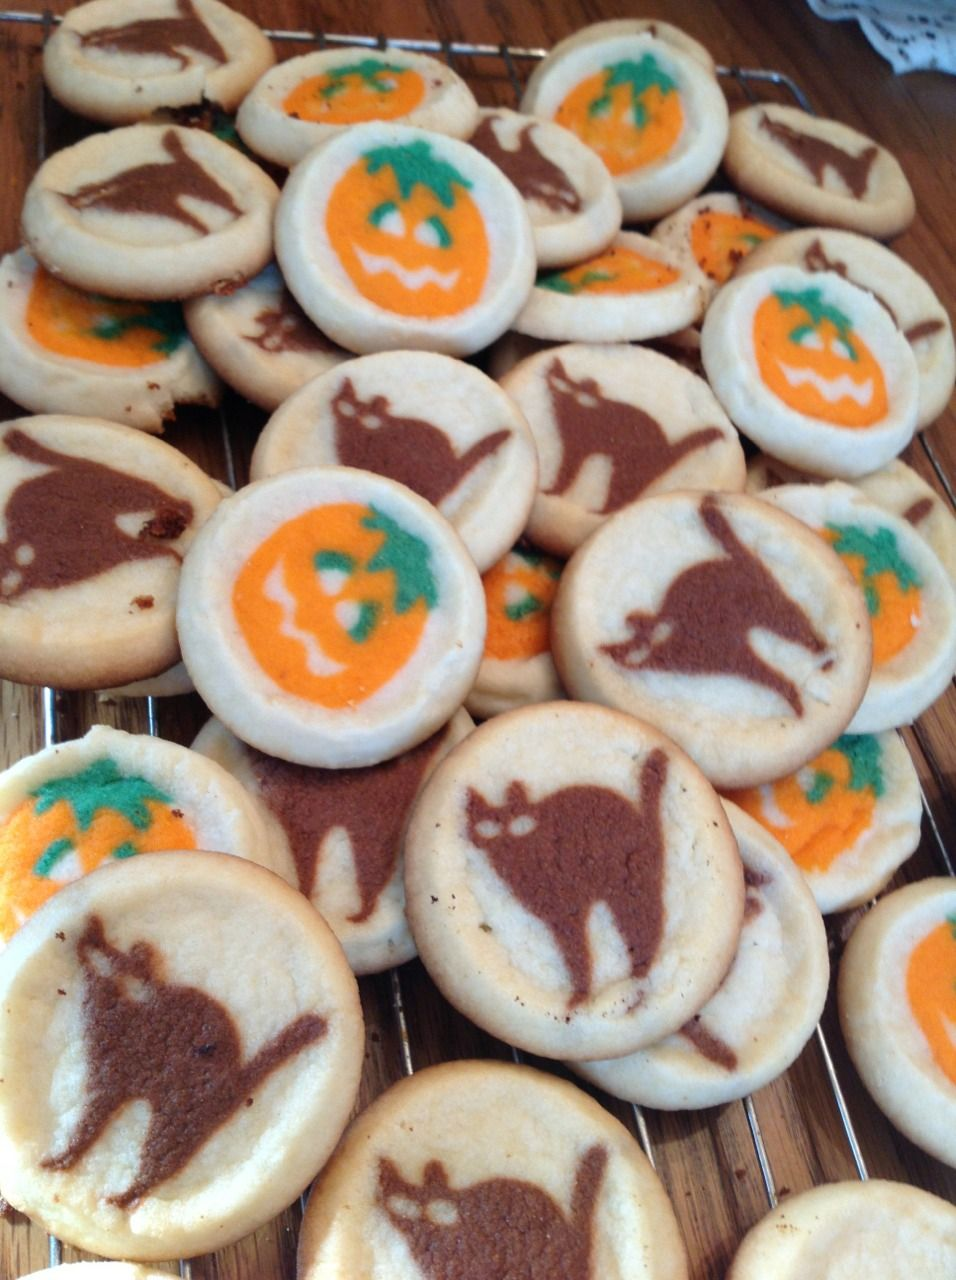 i love these freaking pillsbury cookies man